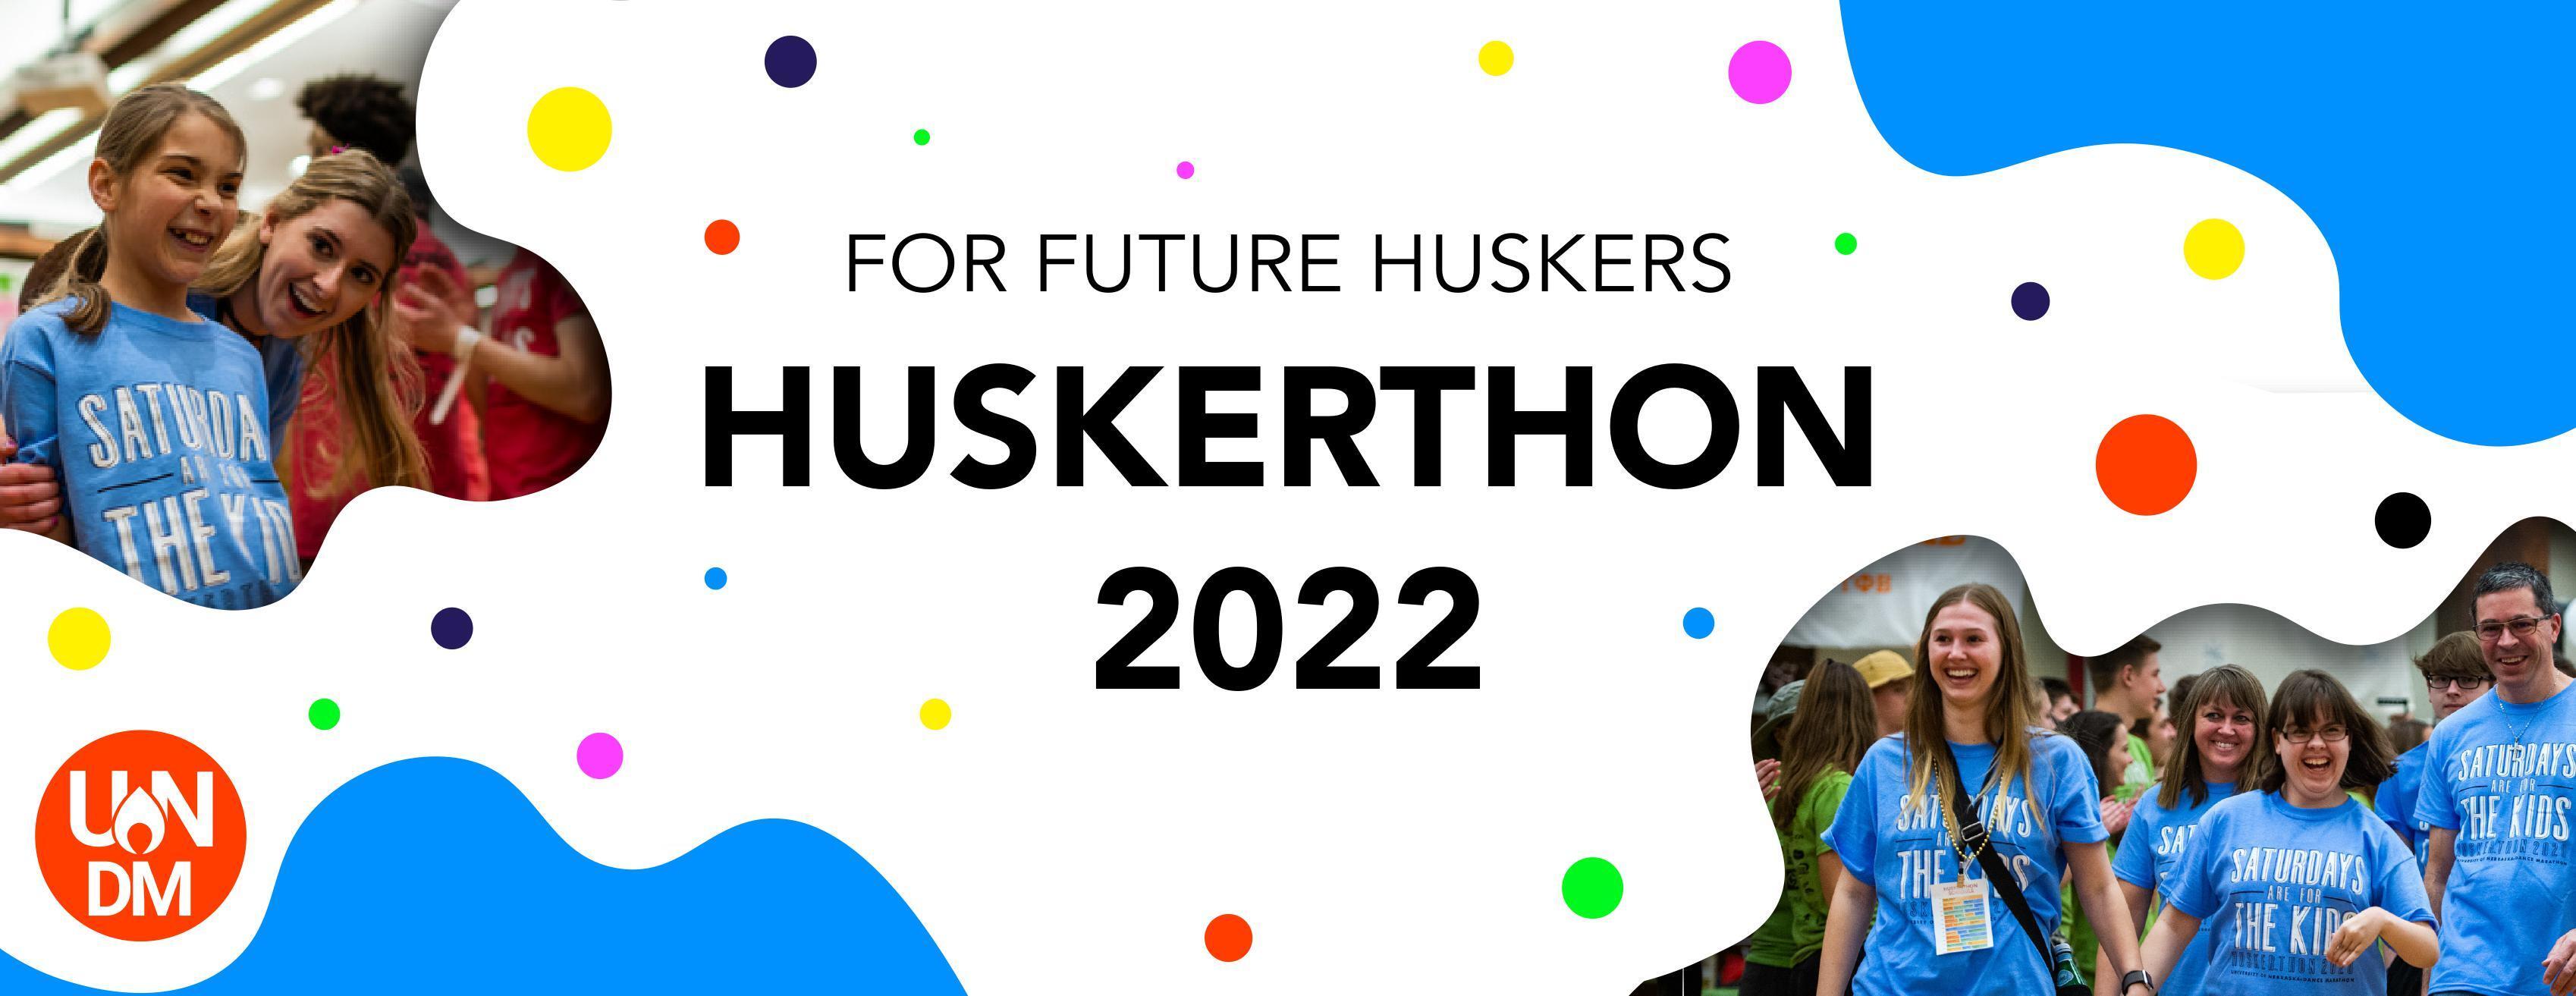 For Future Huskers, HuskerThon 2022